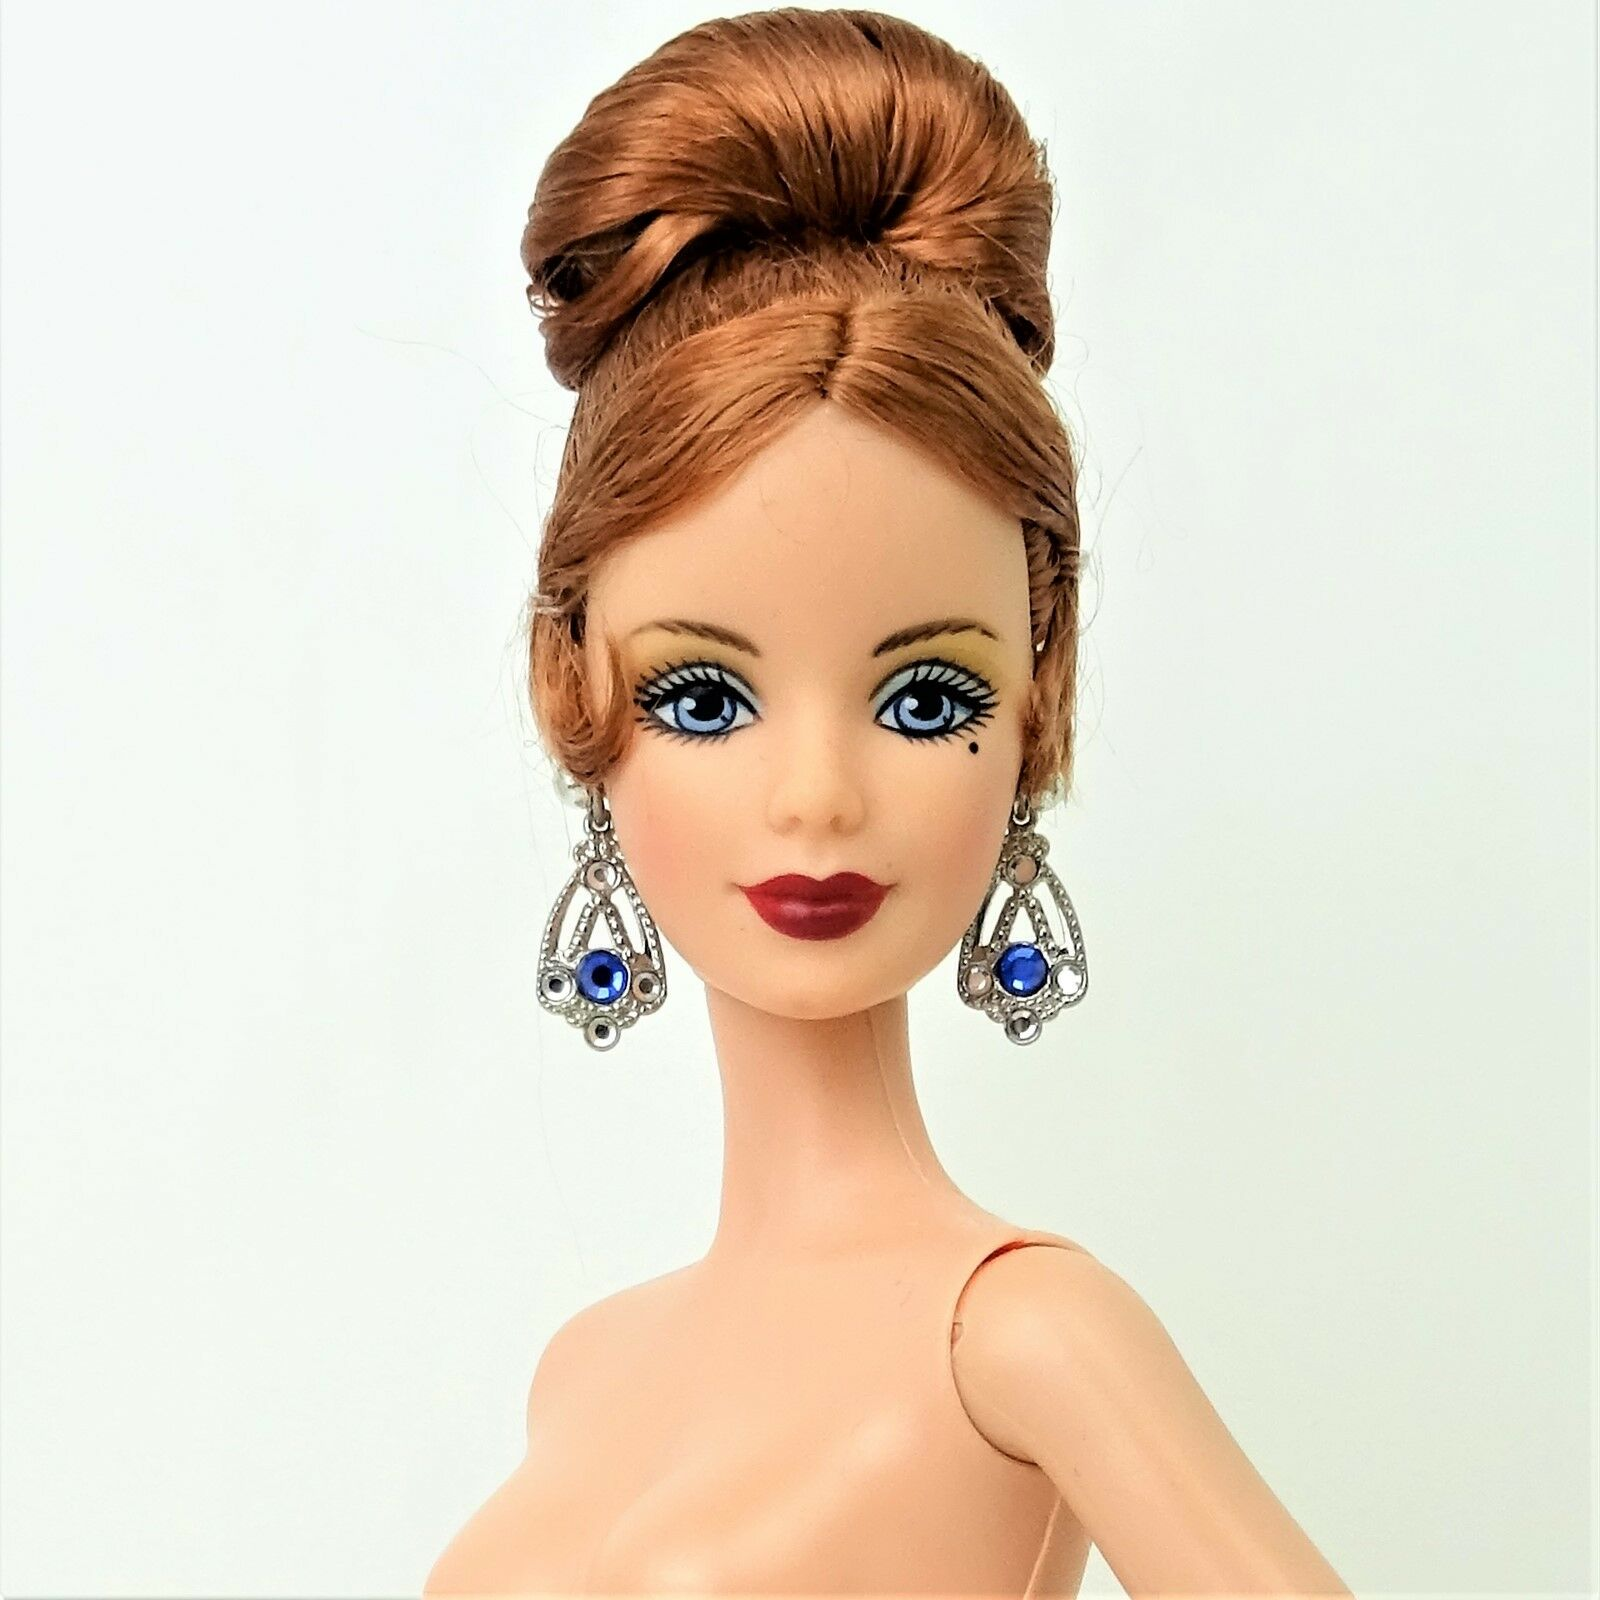 Barbie Embassy Waltz Doll Model Muse HYBRID Nude